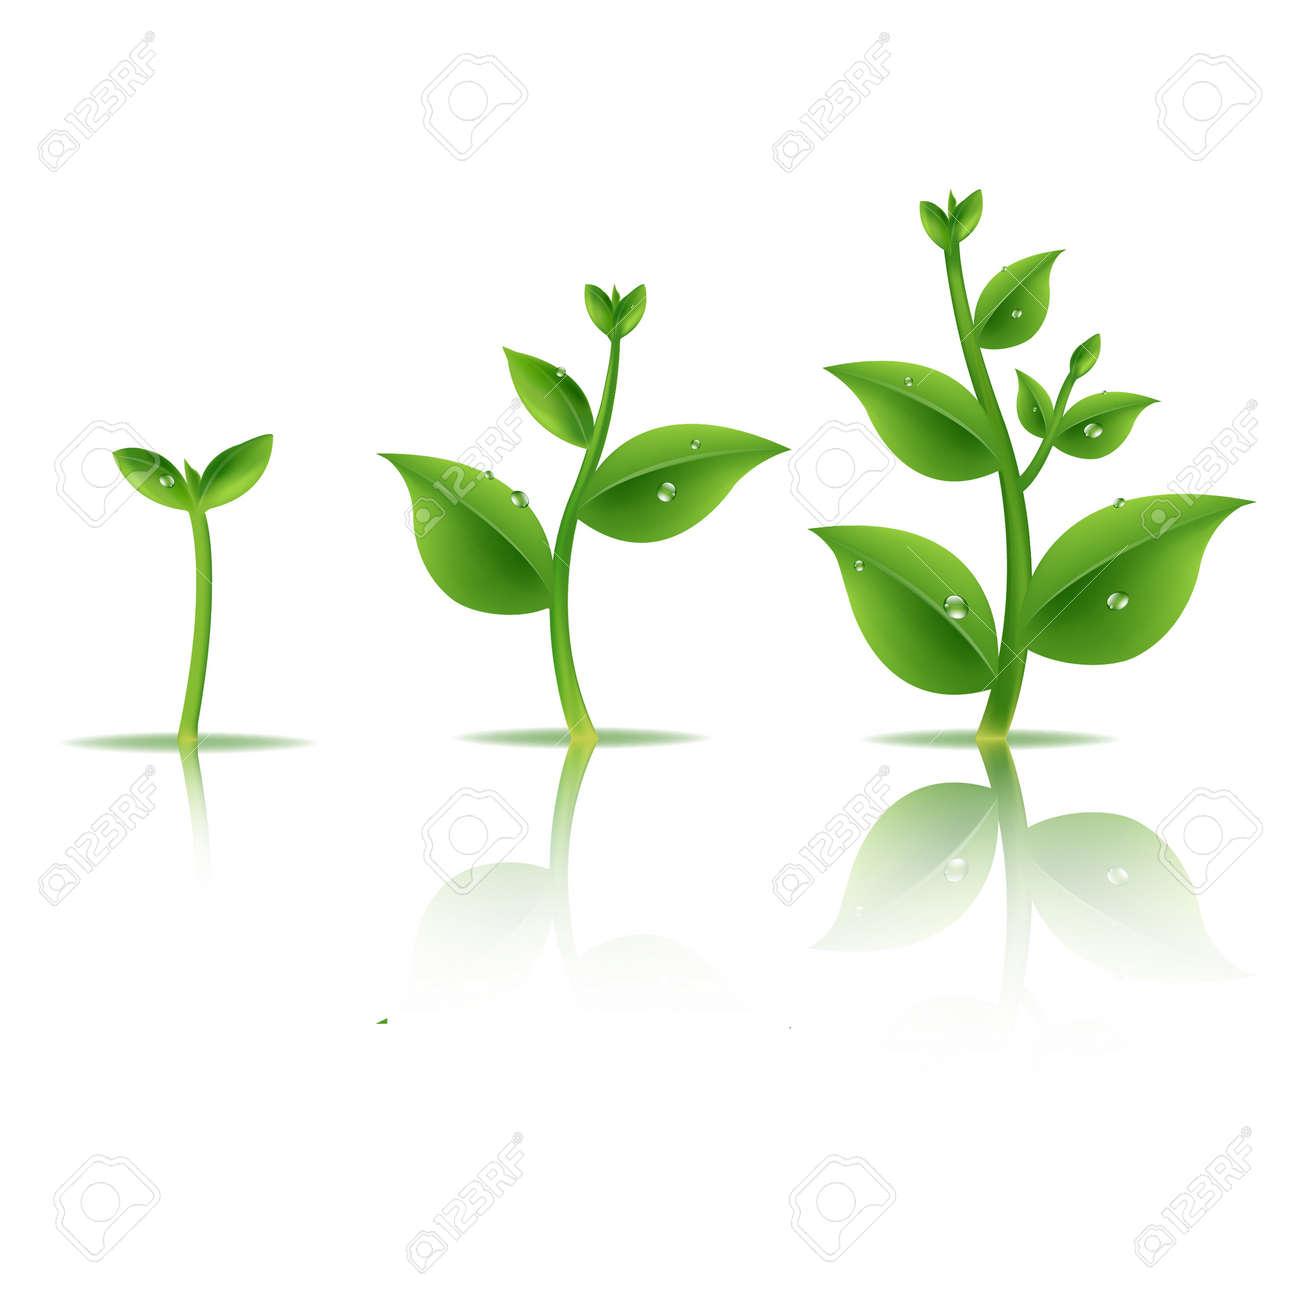 Plant Set With Gradient Mesh, Vector Illustration - 37192045